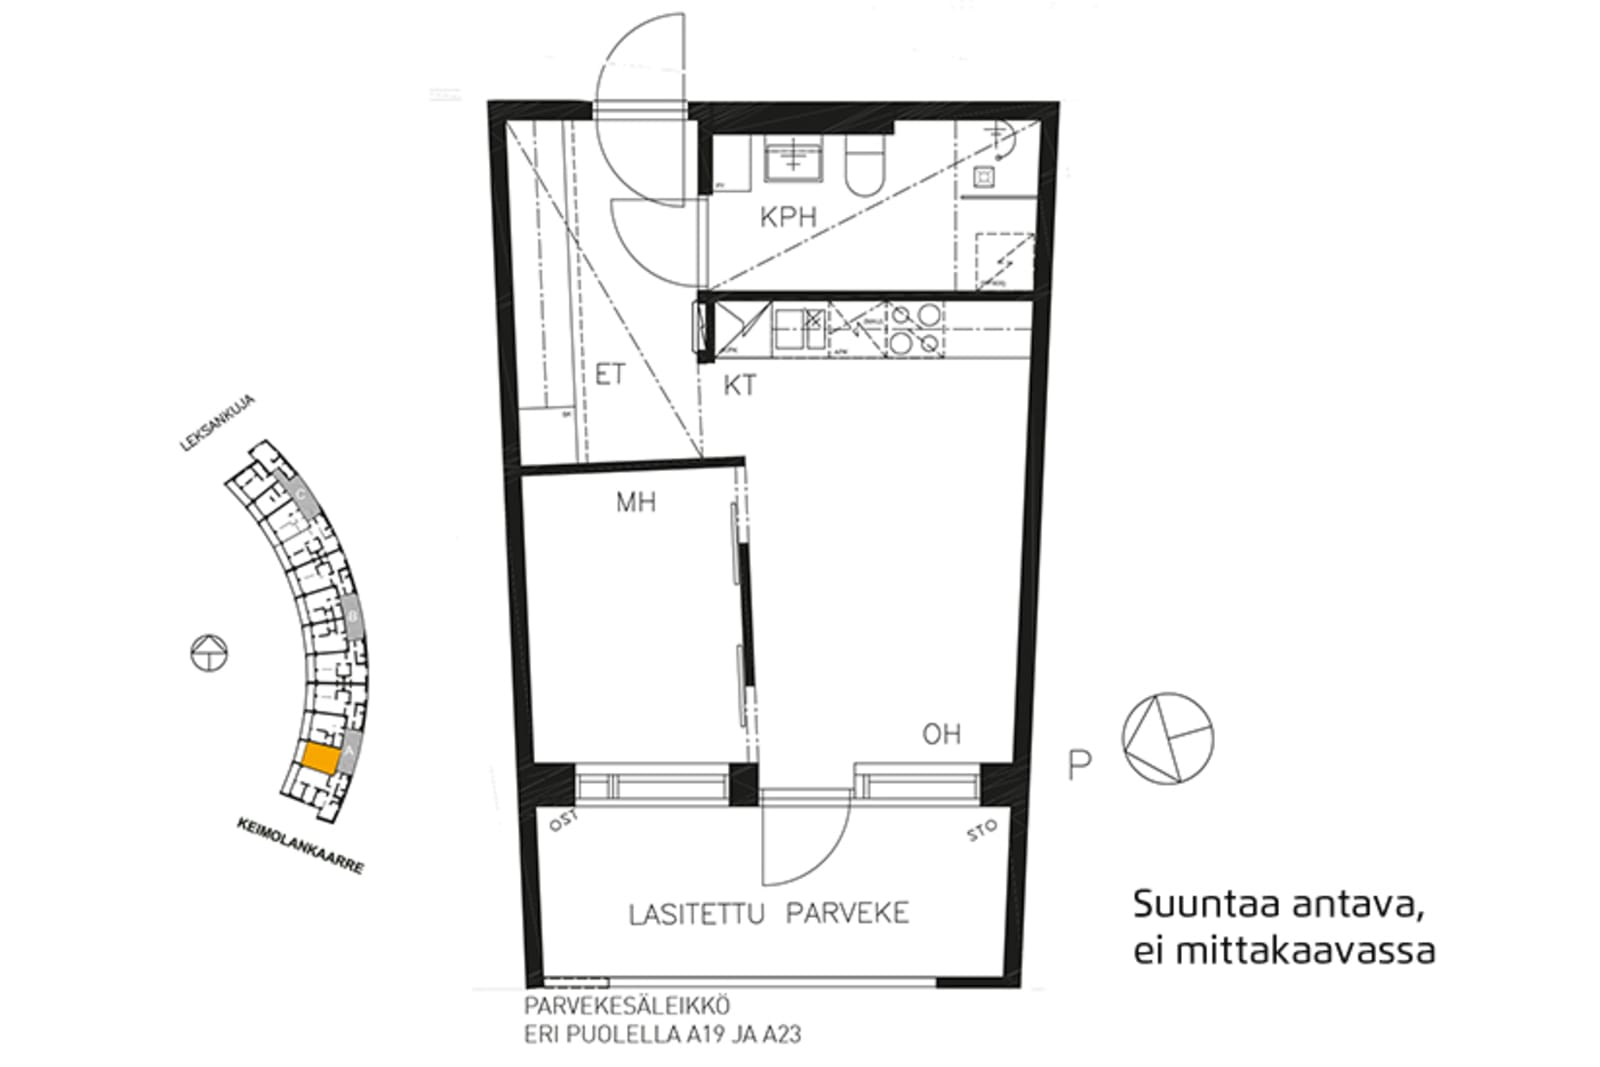 Vantaa, Keimolanmäki, Leksankuja 3 A 015